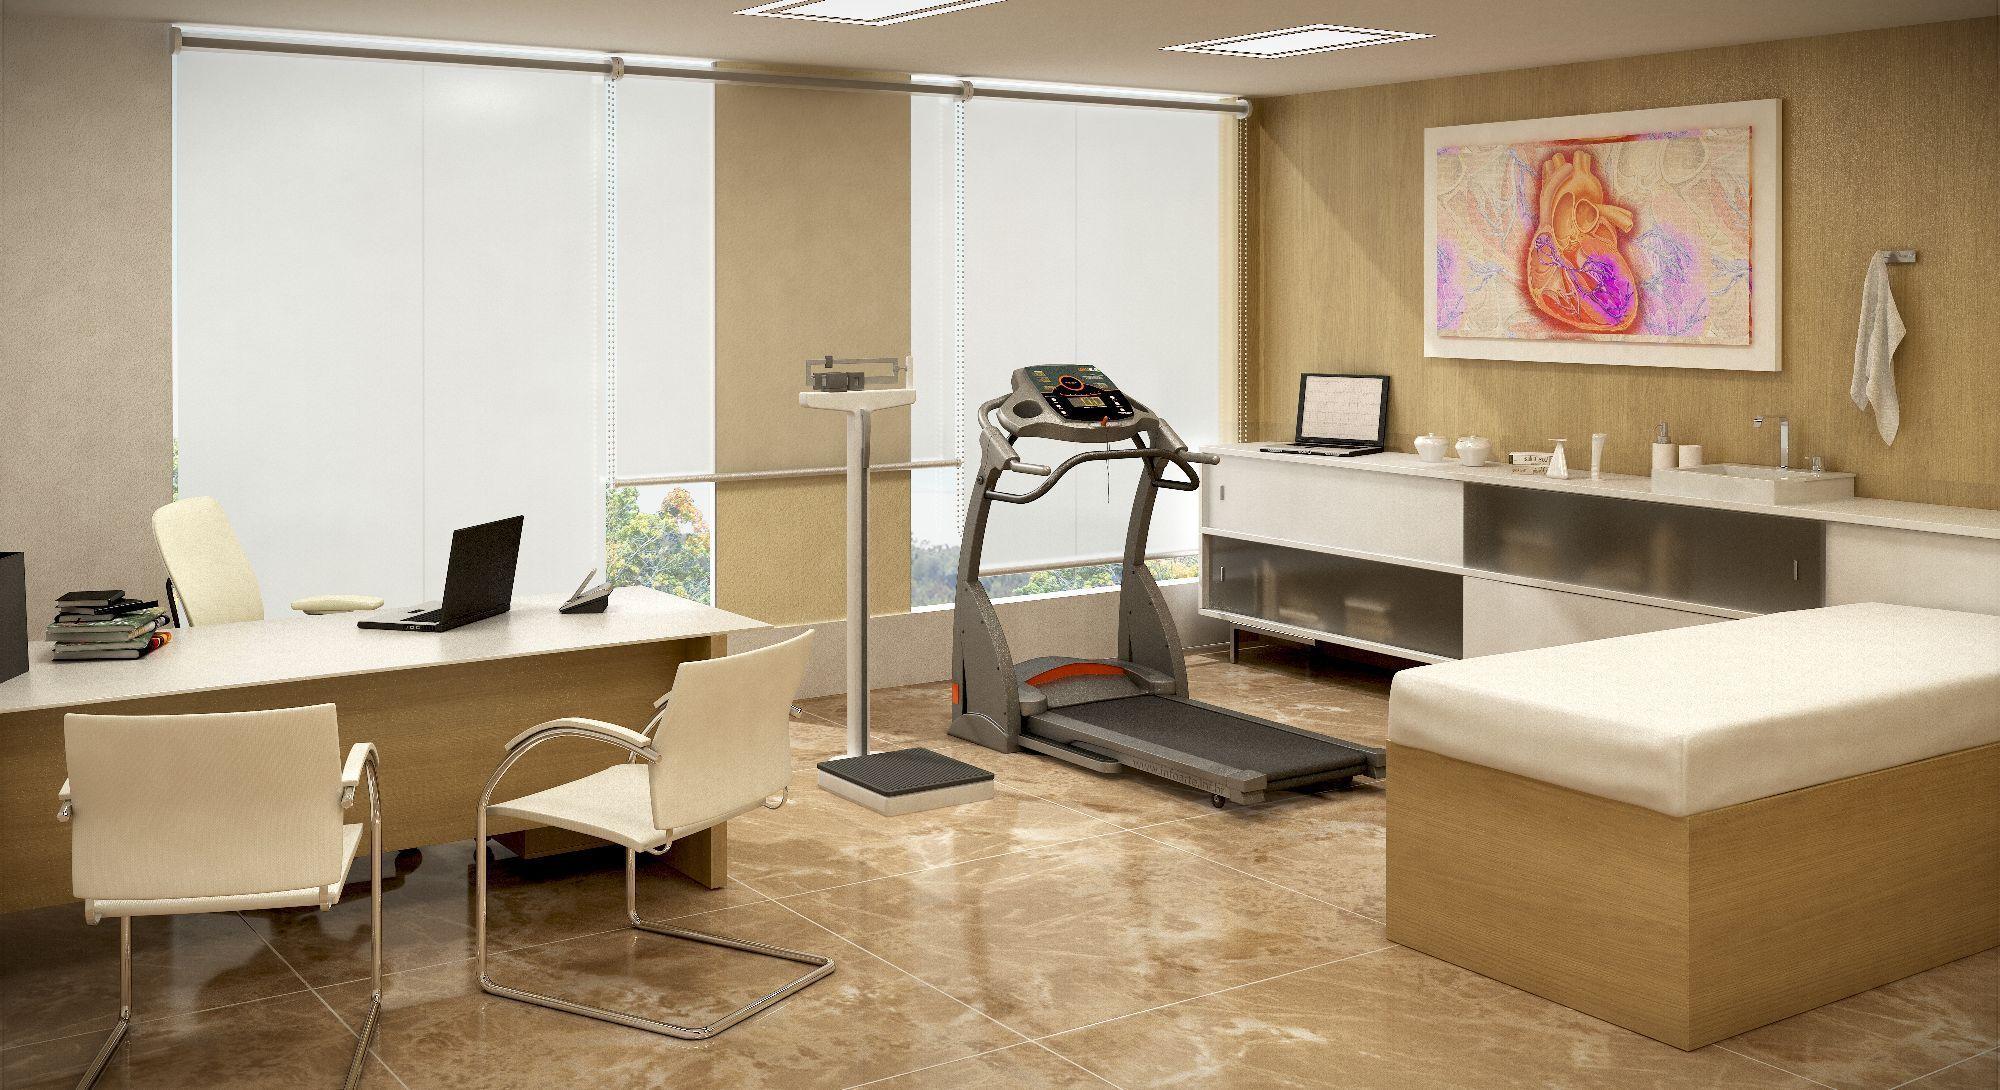 Consult Rio Cardiologia Consult Rio Medical Office Pinterest  # Muebles Para Consultorio Nutricional